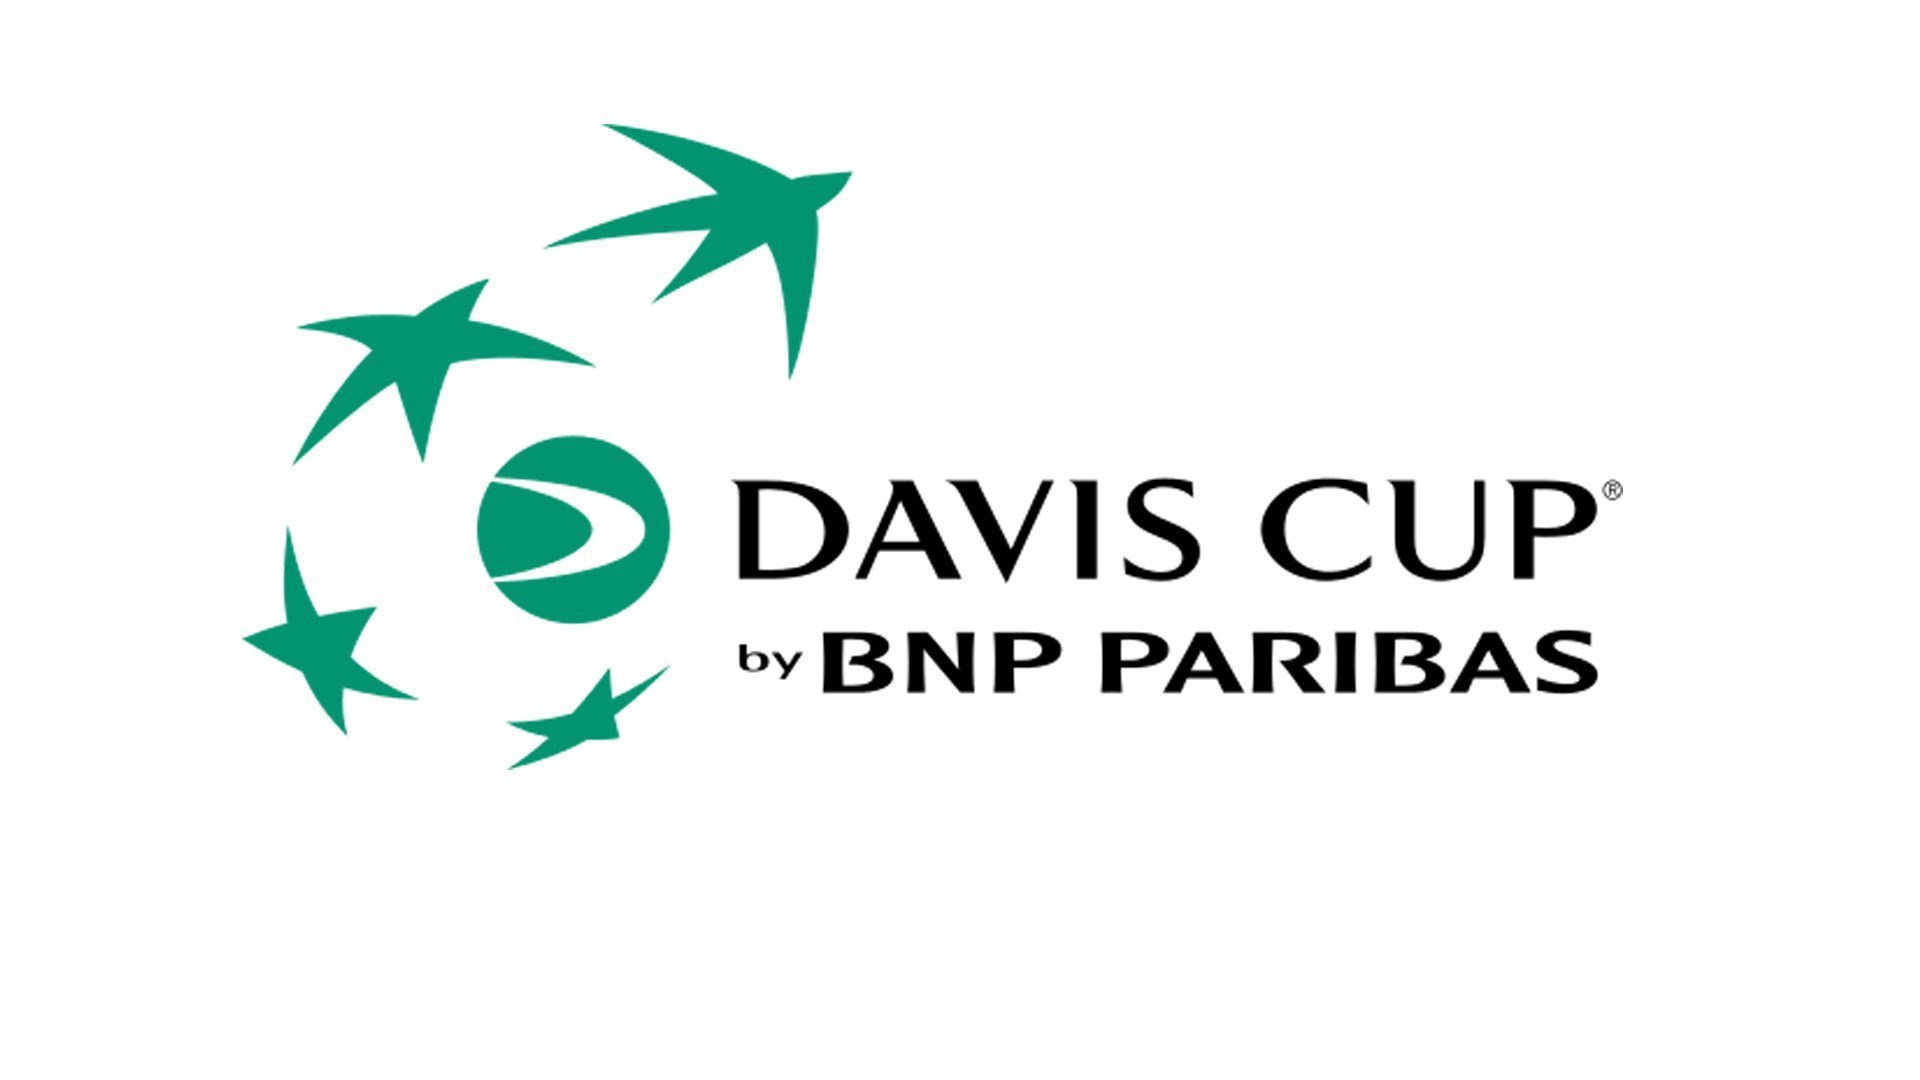 davis-cup-logo-images-2015.jpg